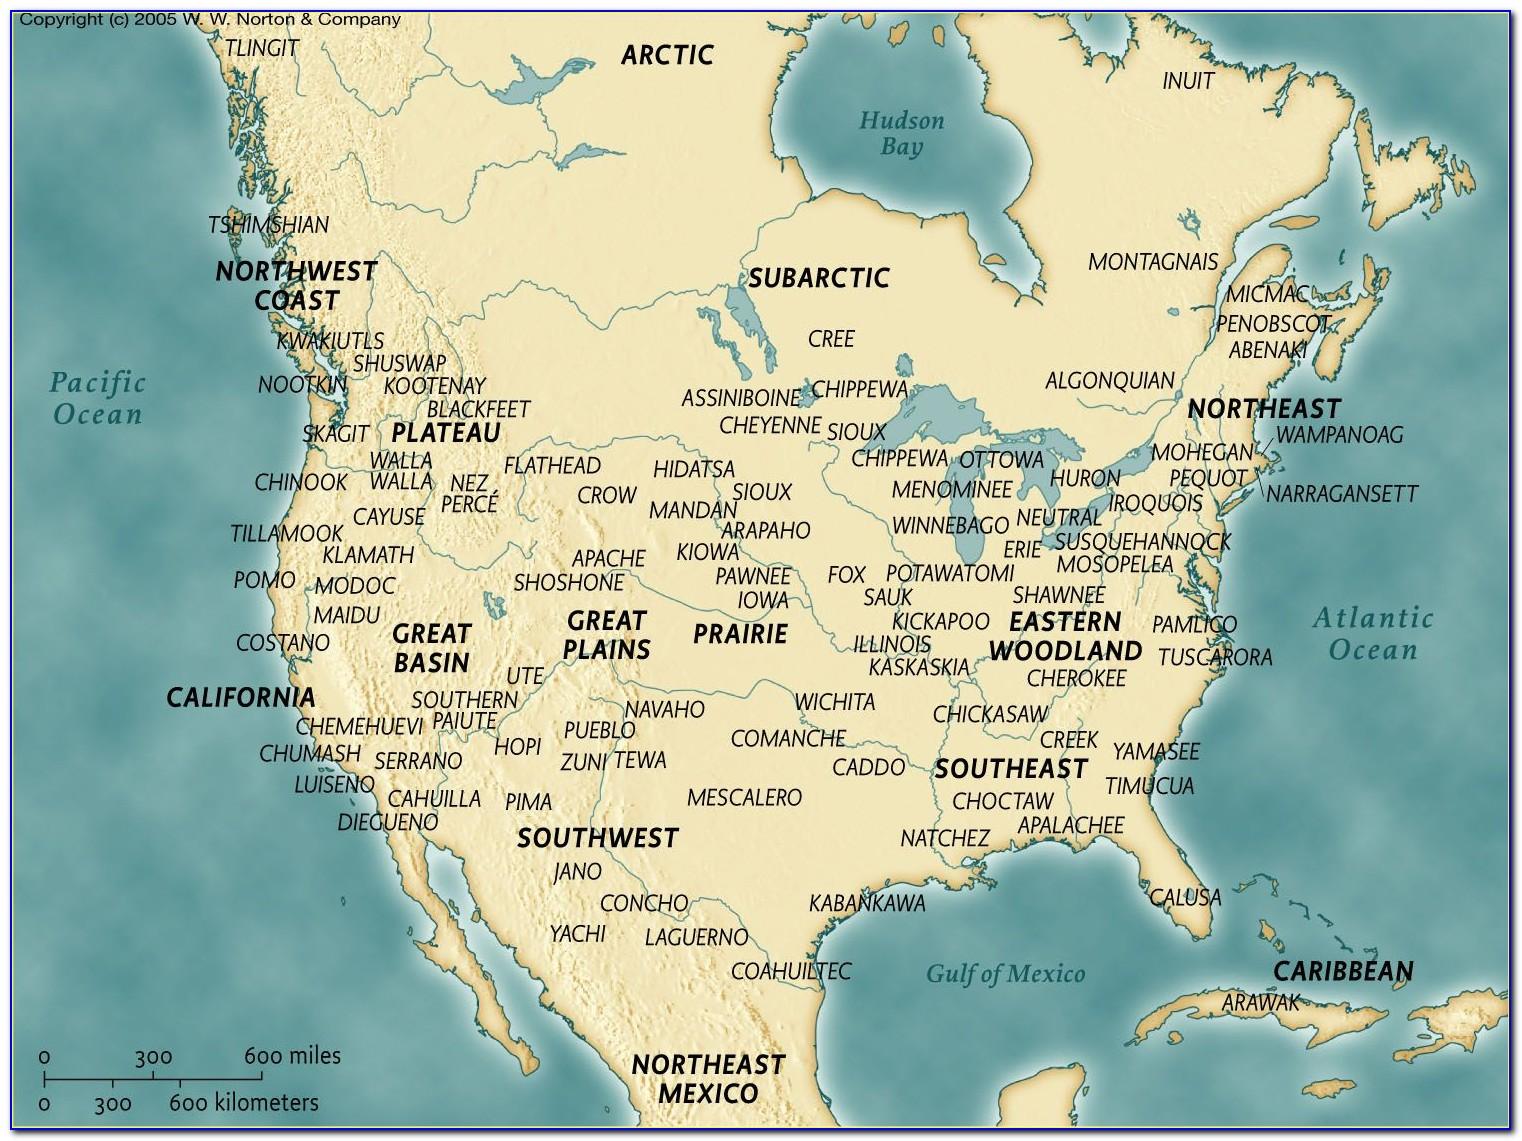 Map Of Native American Territories In North America